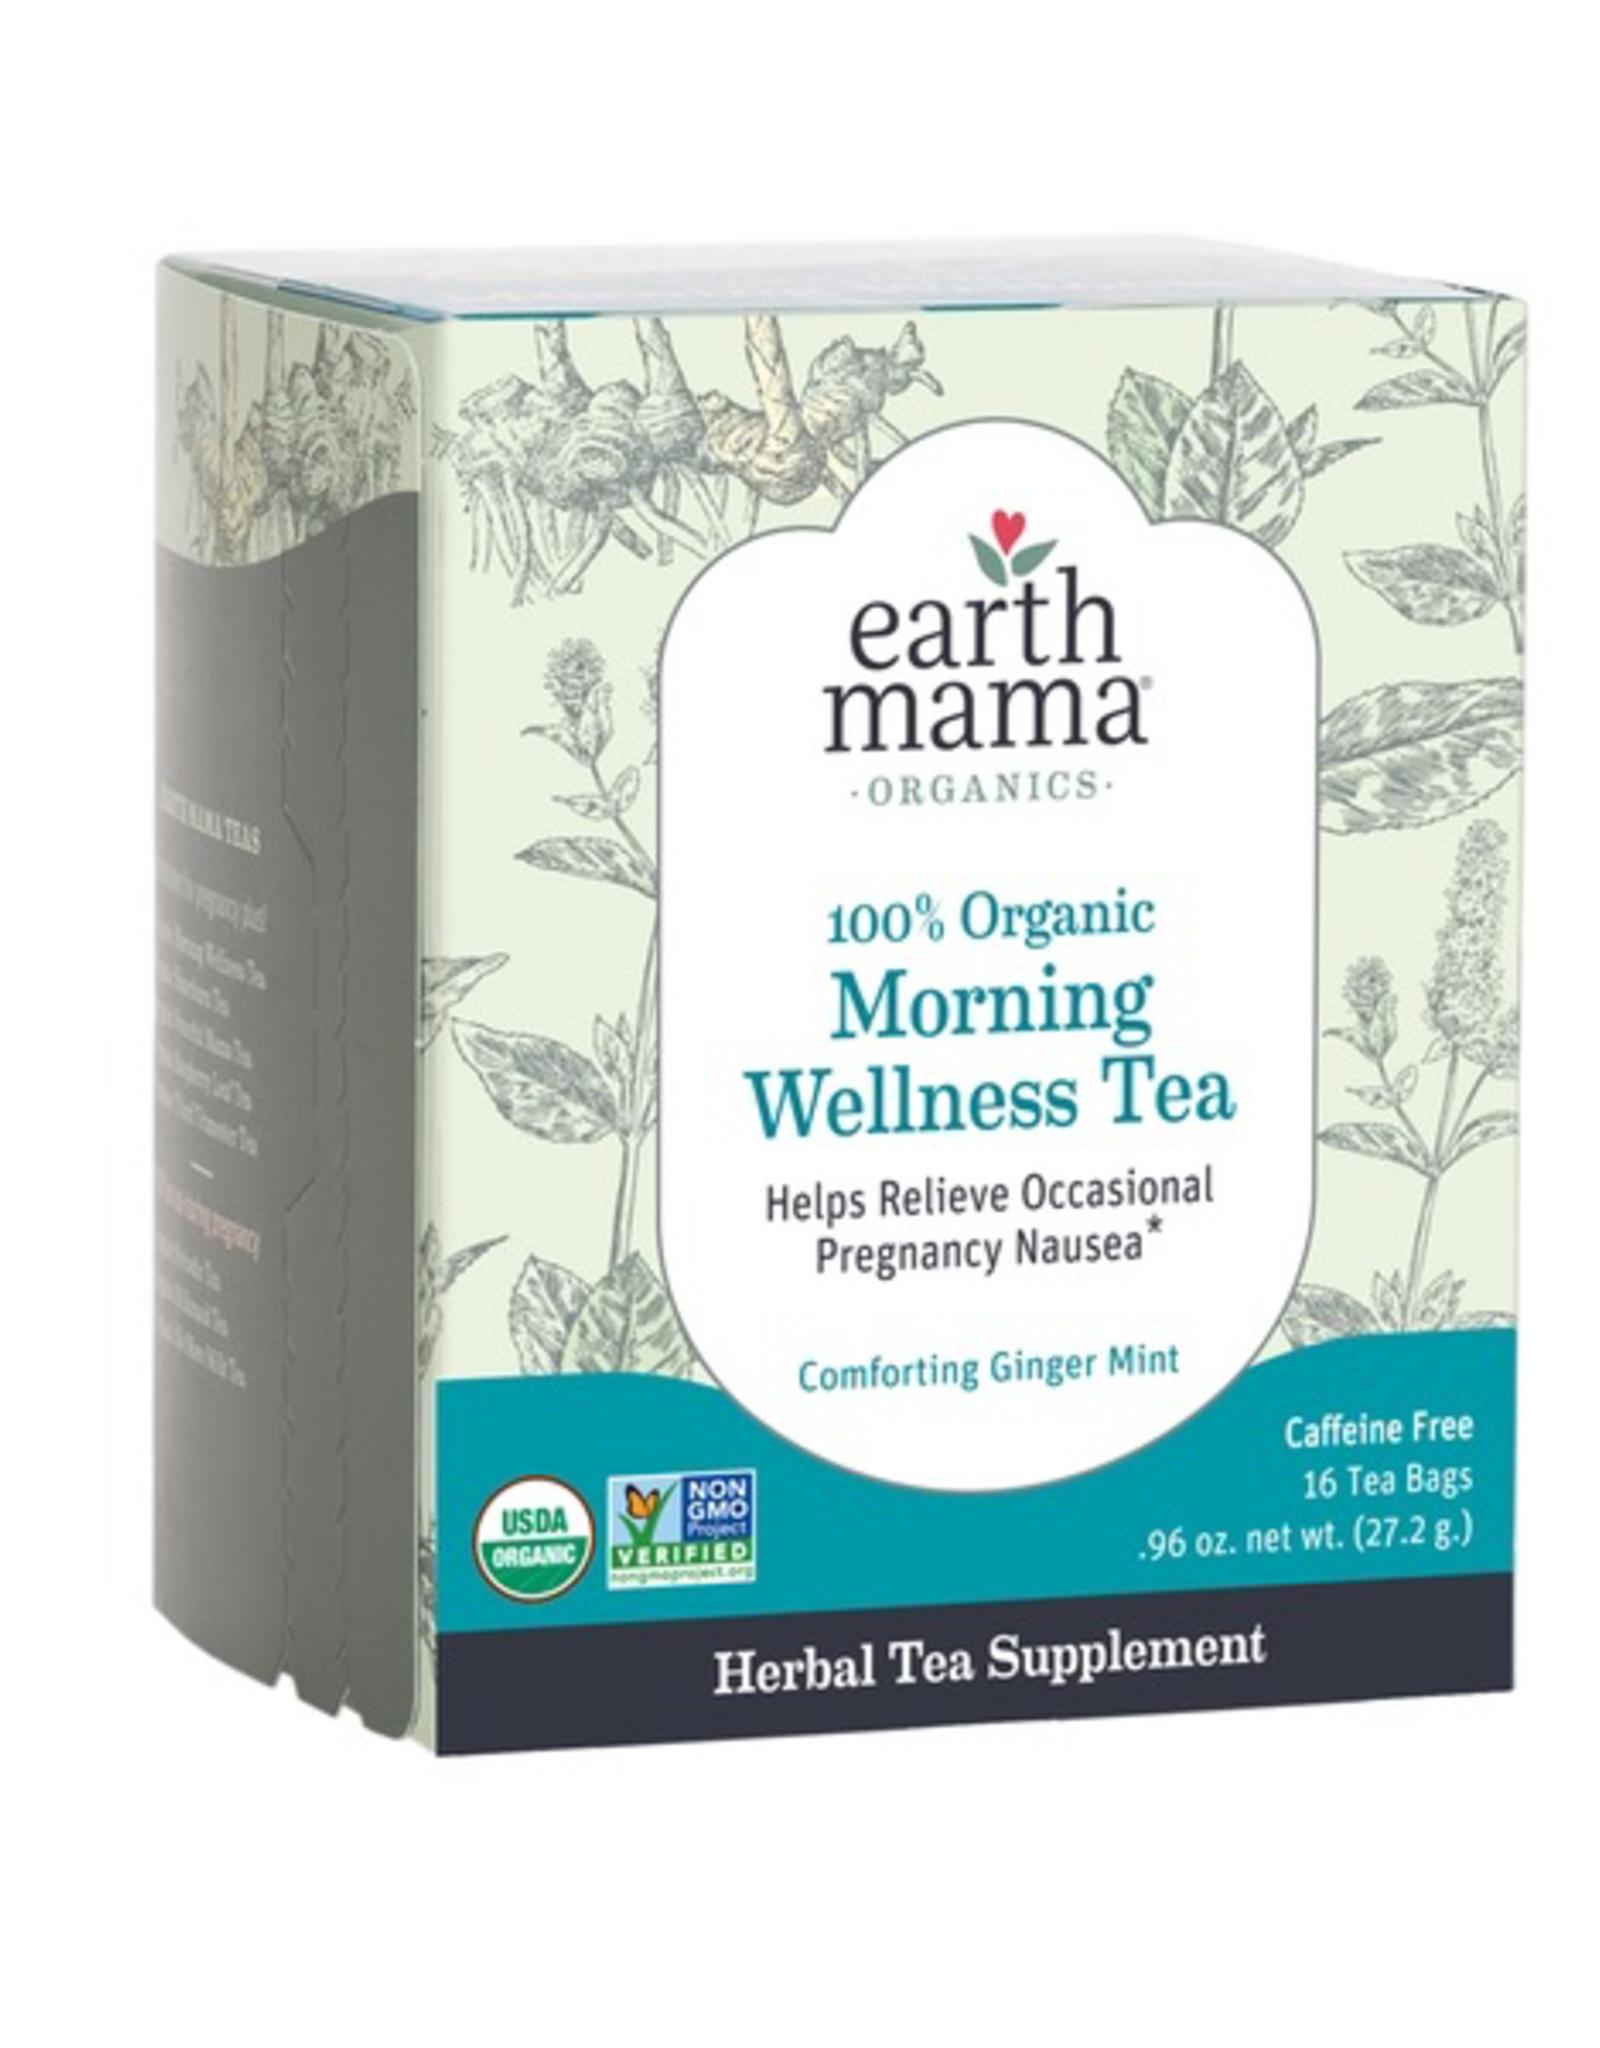 Earth Mama 100% Organic Morning Wellness Tea